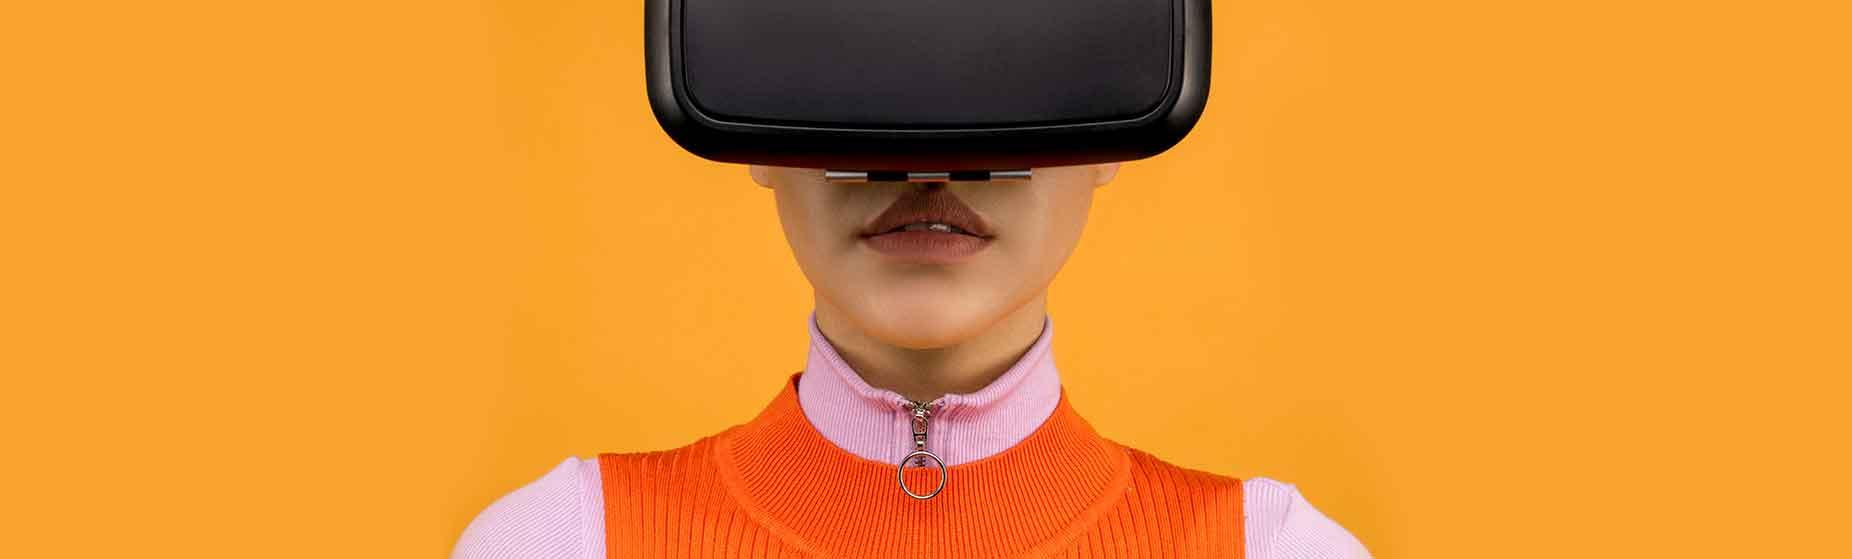 realtà virtuale e VR globalcosmesi